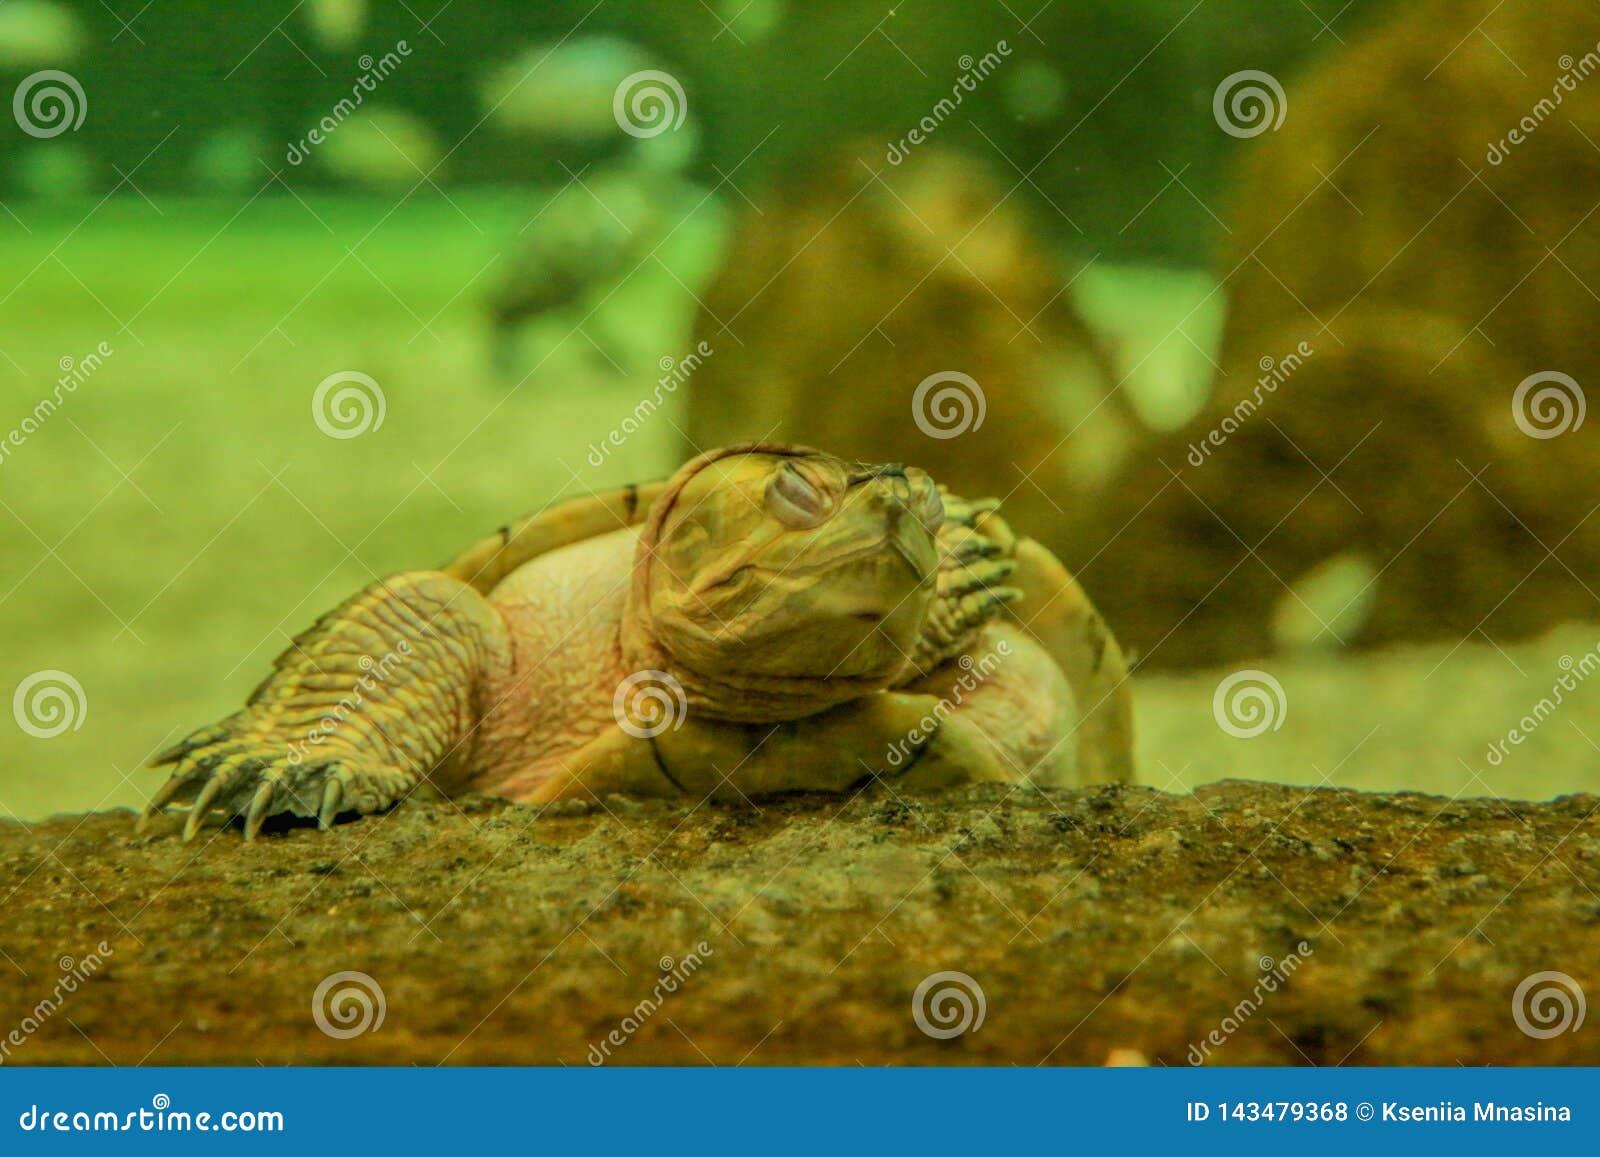 Turtle sleeping on the stone